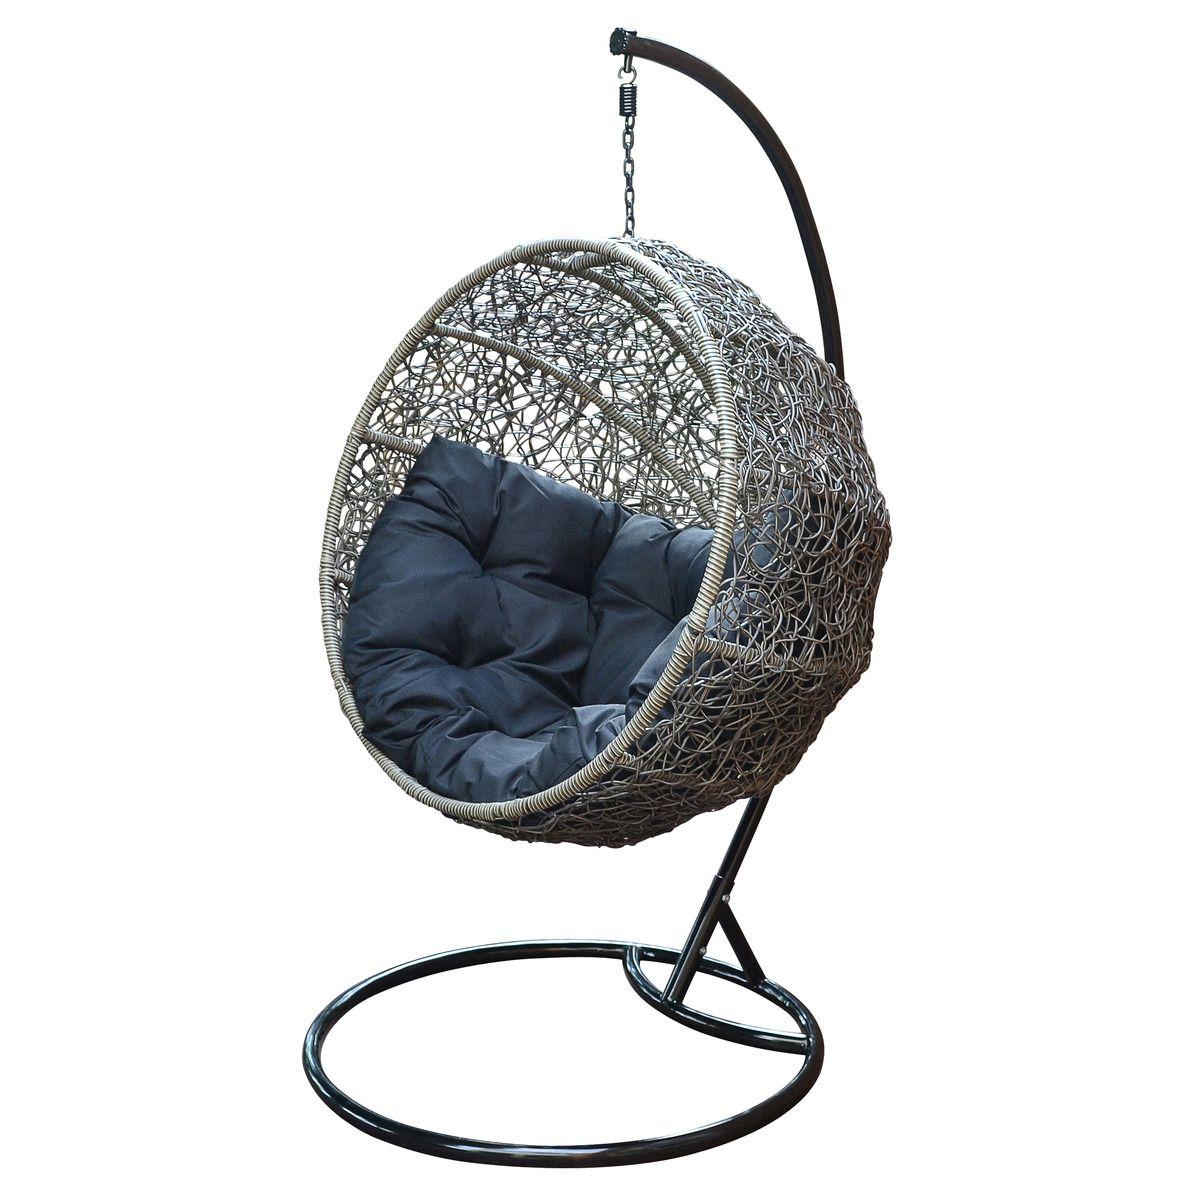 round back wicker chair | NEW Grey Round Hanging Wicker ...